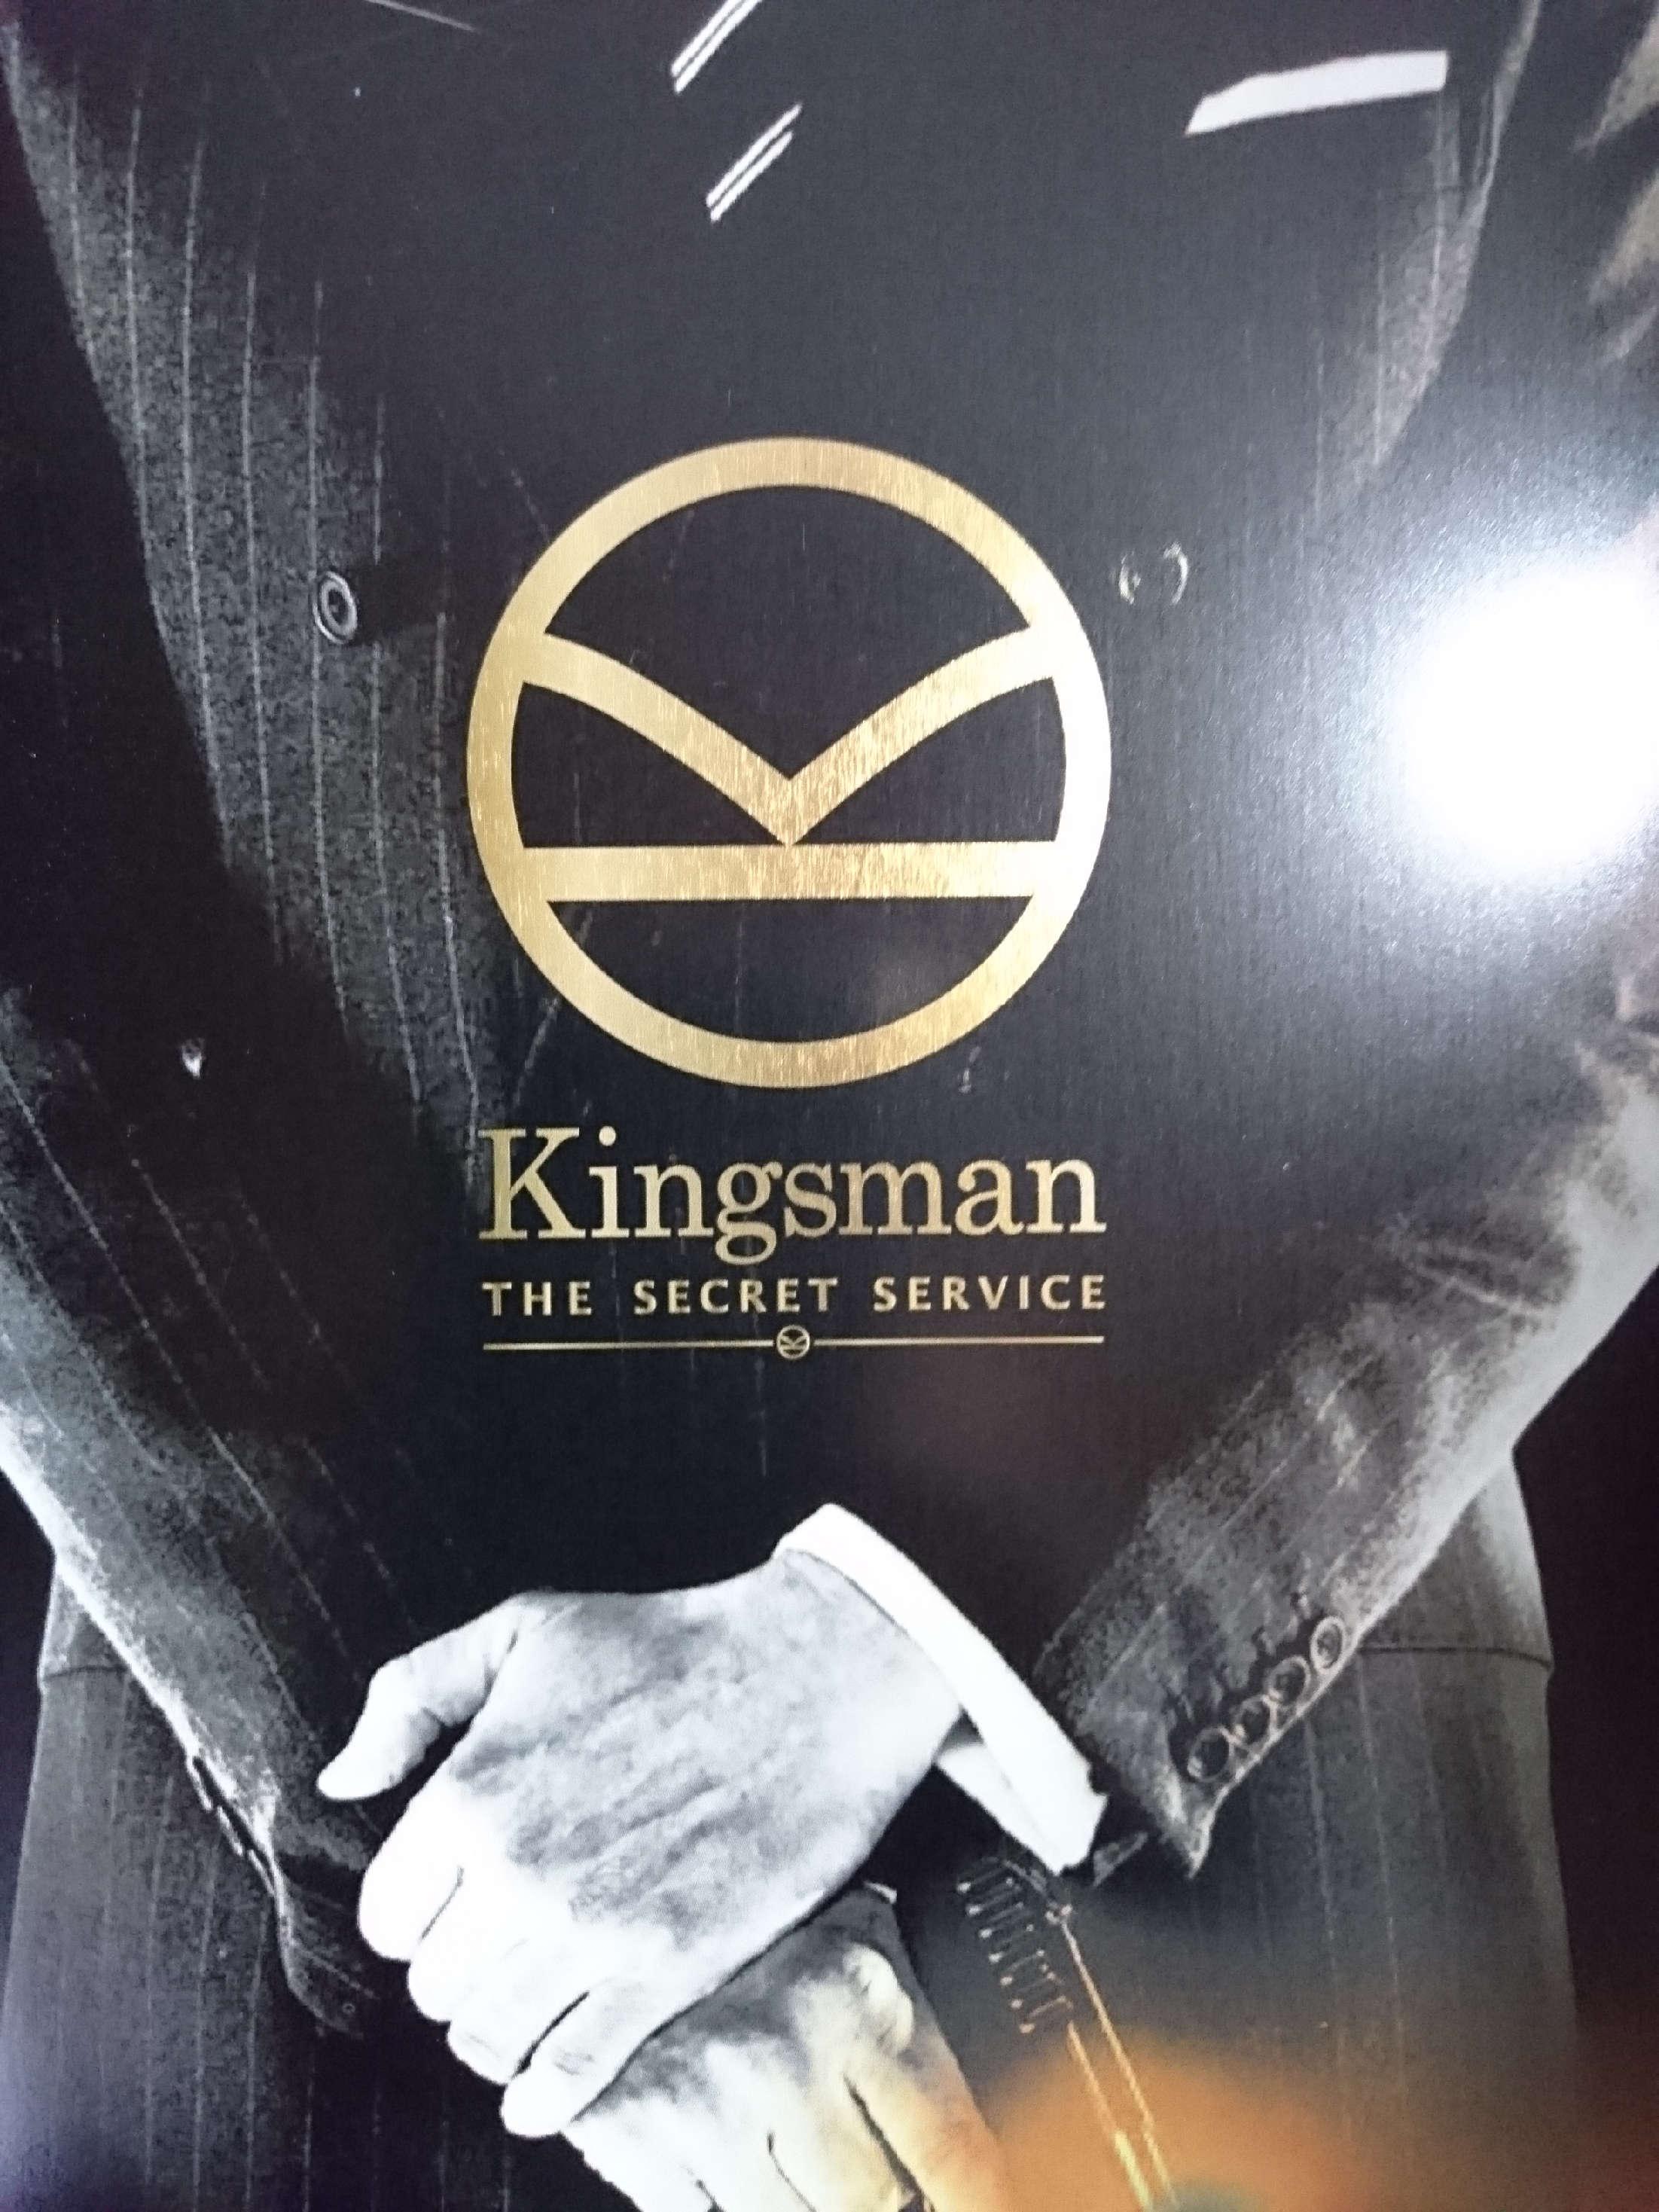 Kingsman2.jpg